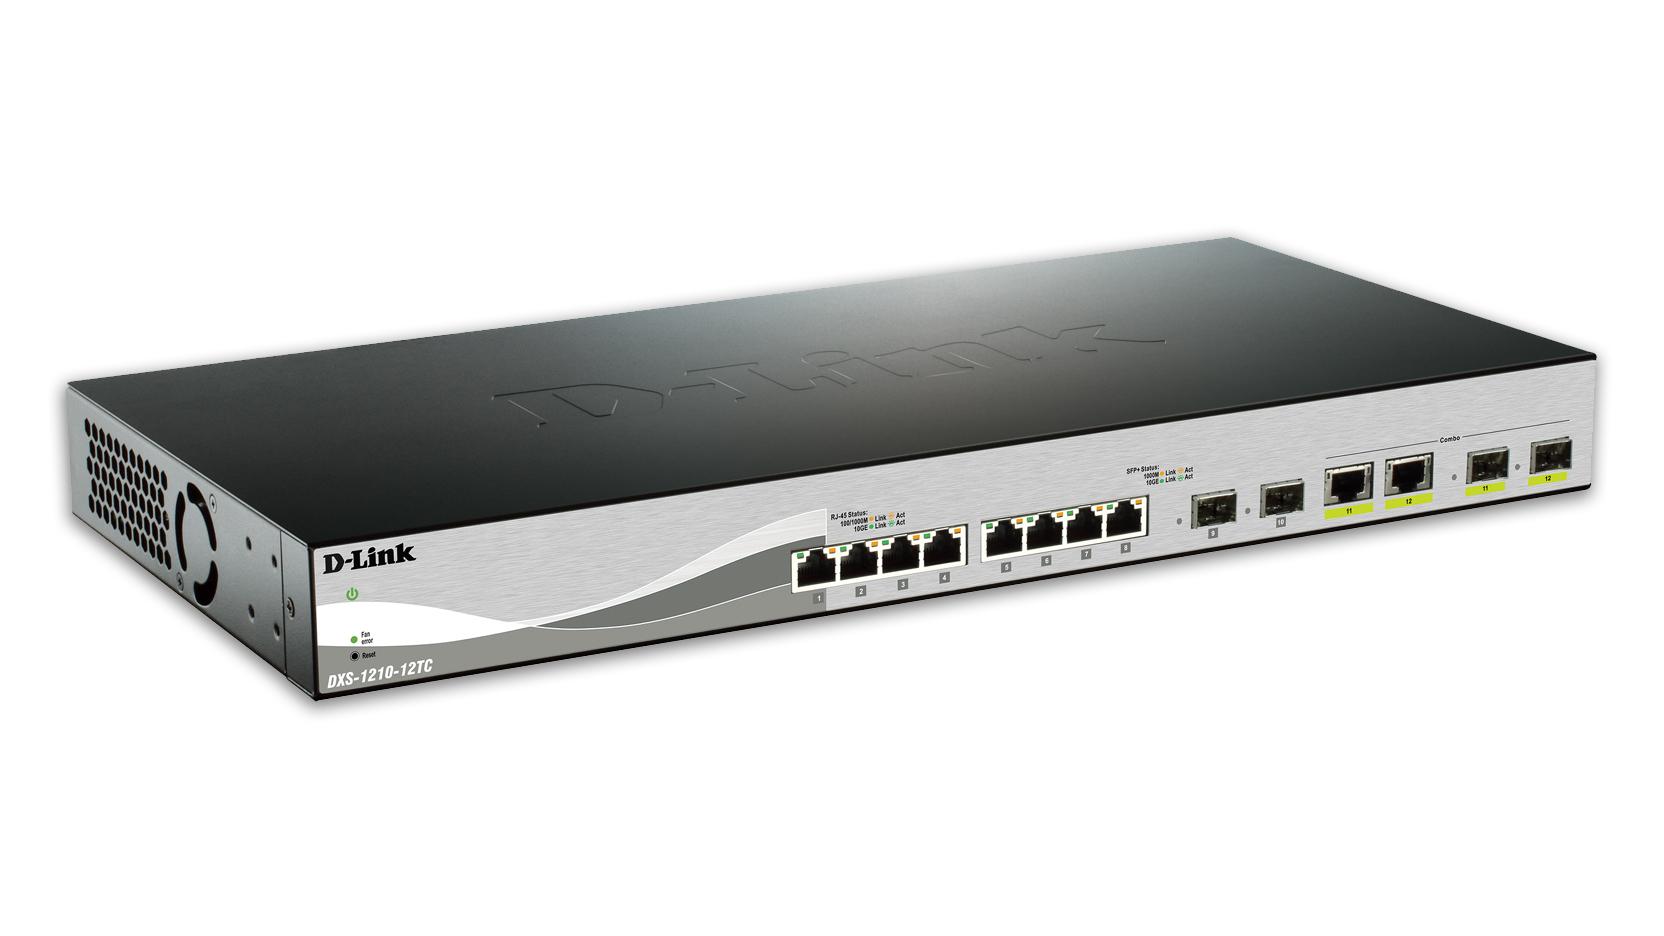 D-Link DXS-1210-12TC switch Gestionado L2 10G Ethernet (100/1000/10000) Negro, Plata 1U